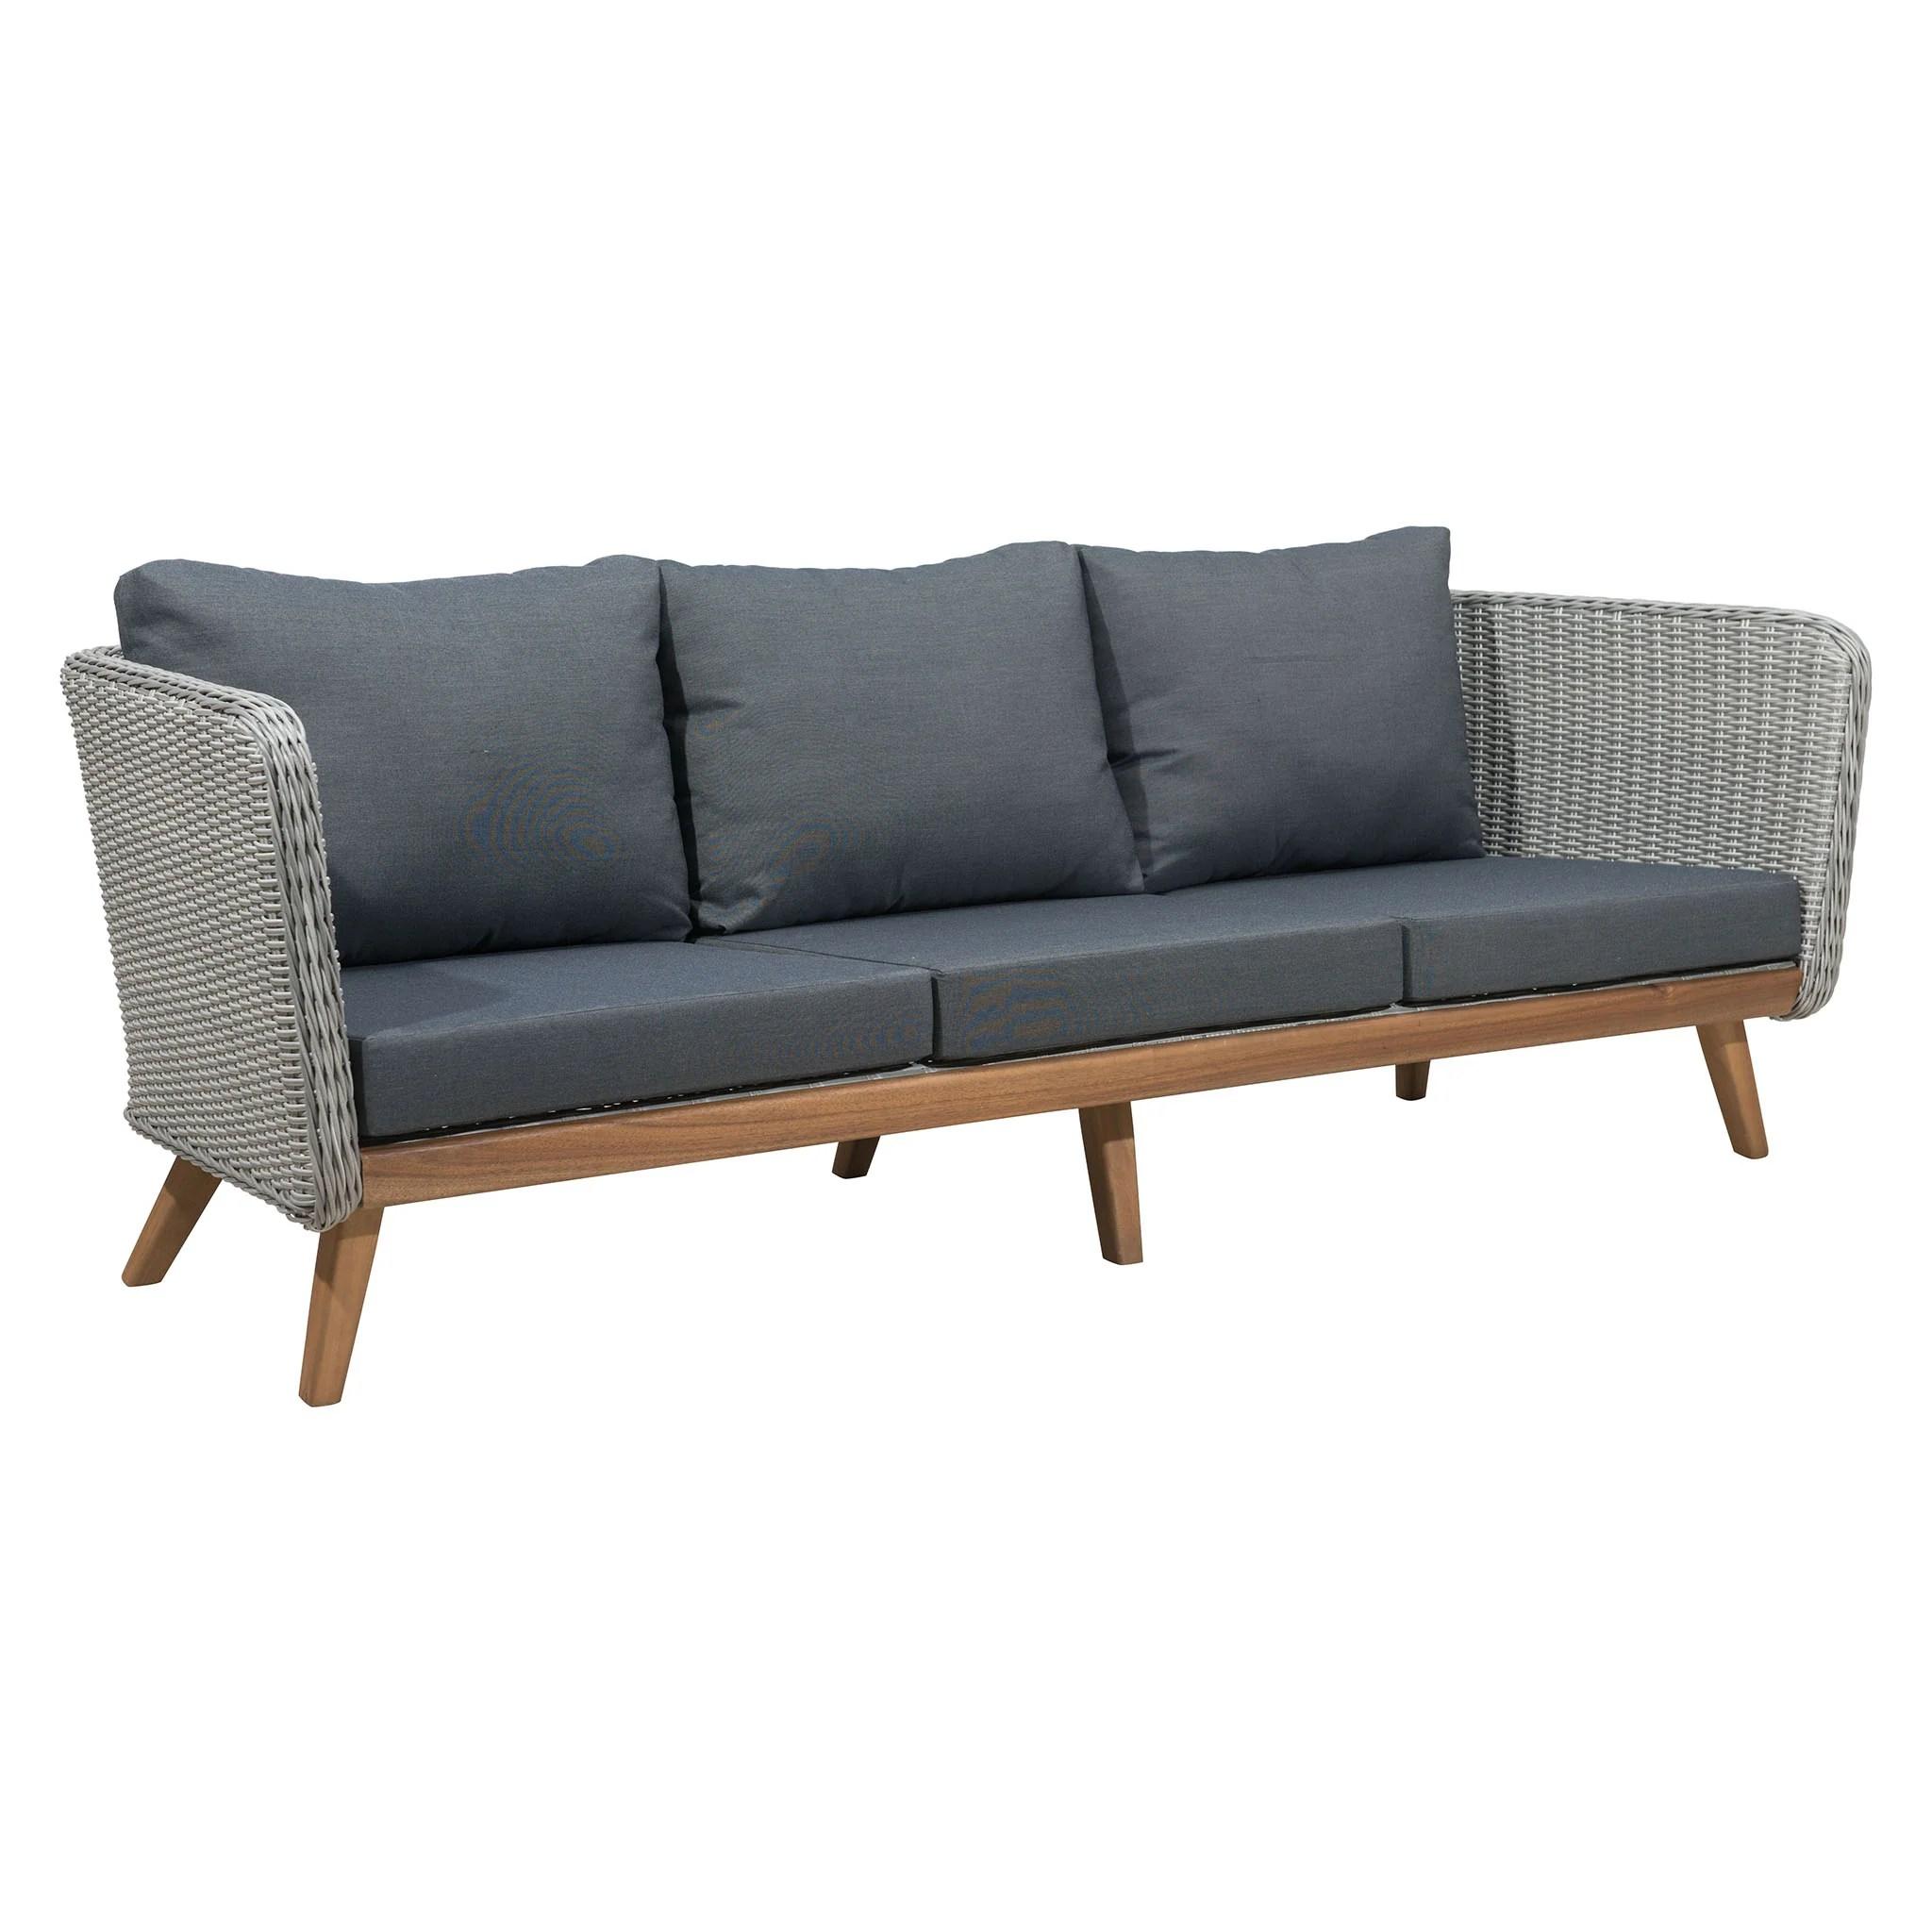 bay sofa brown leather high back grace evans lane